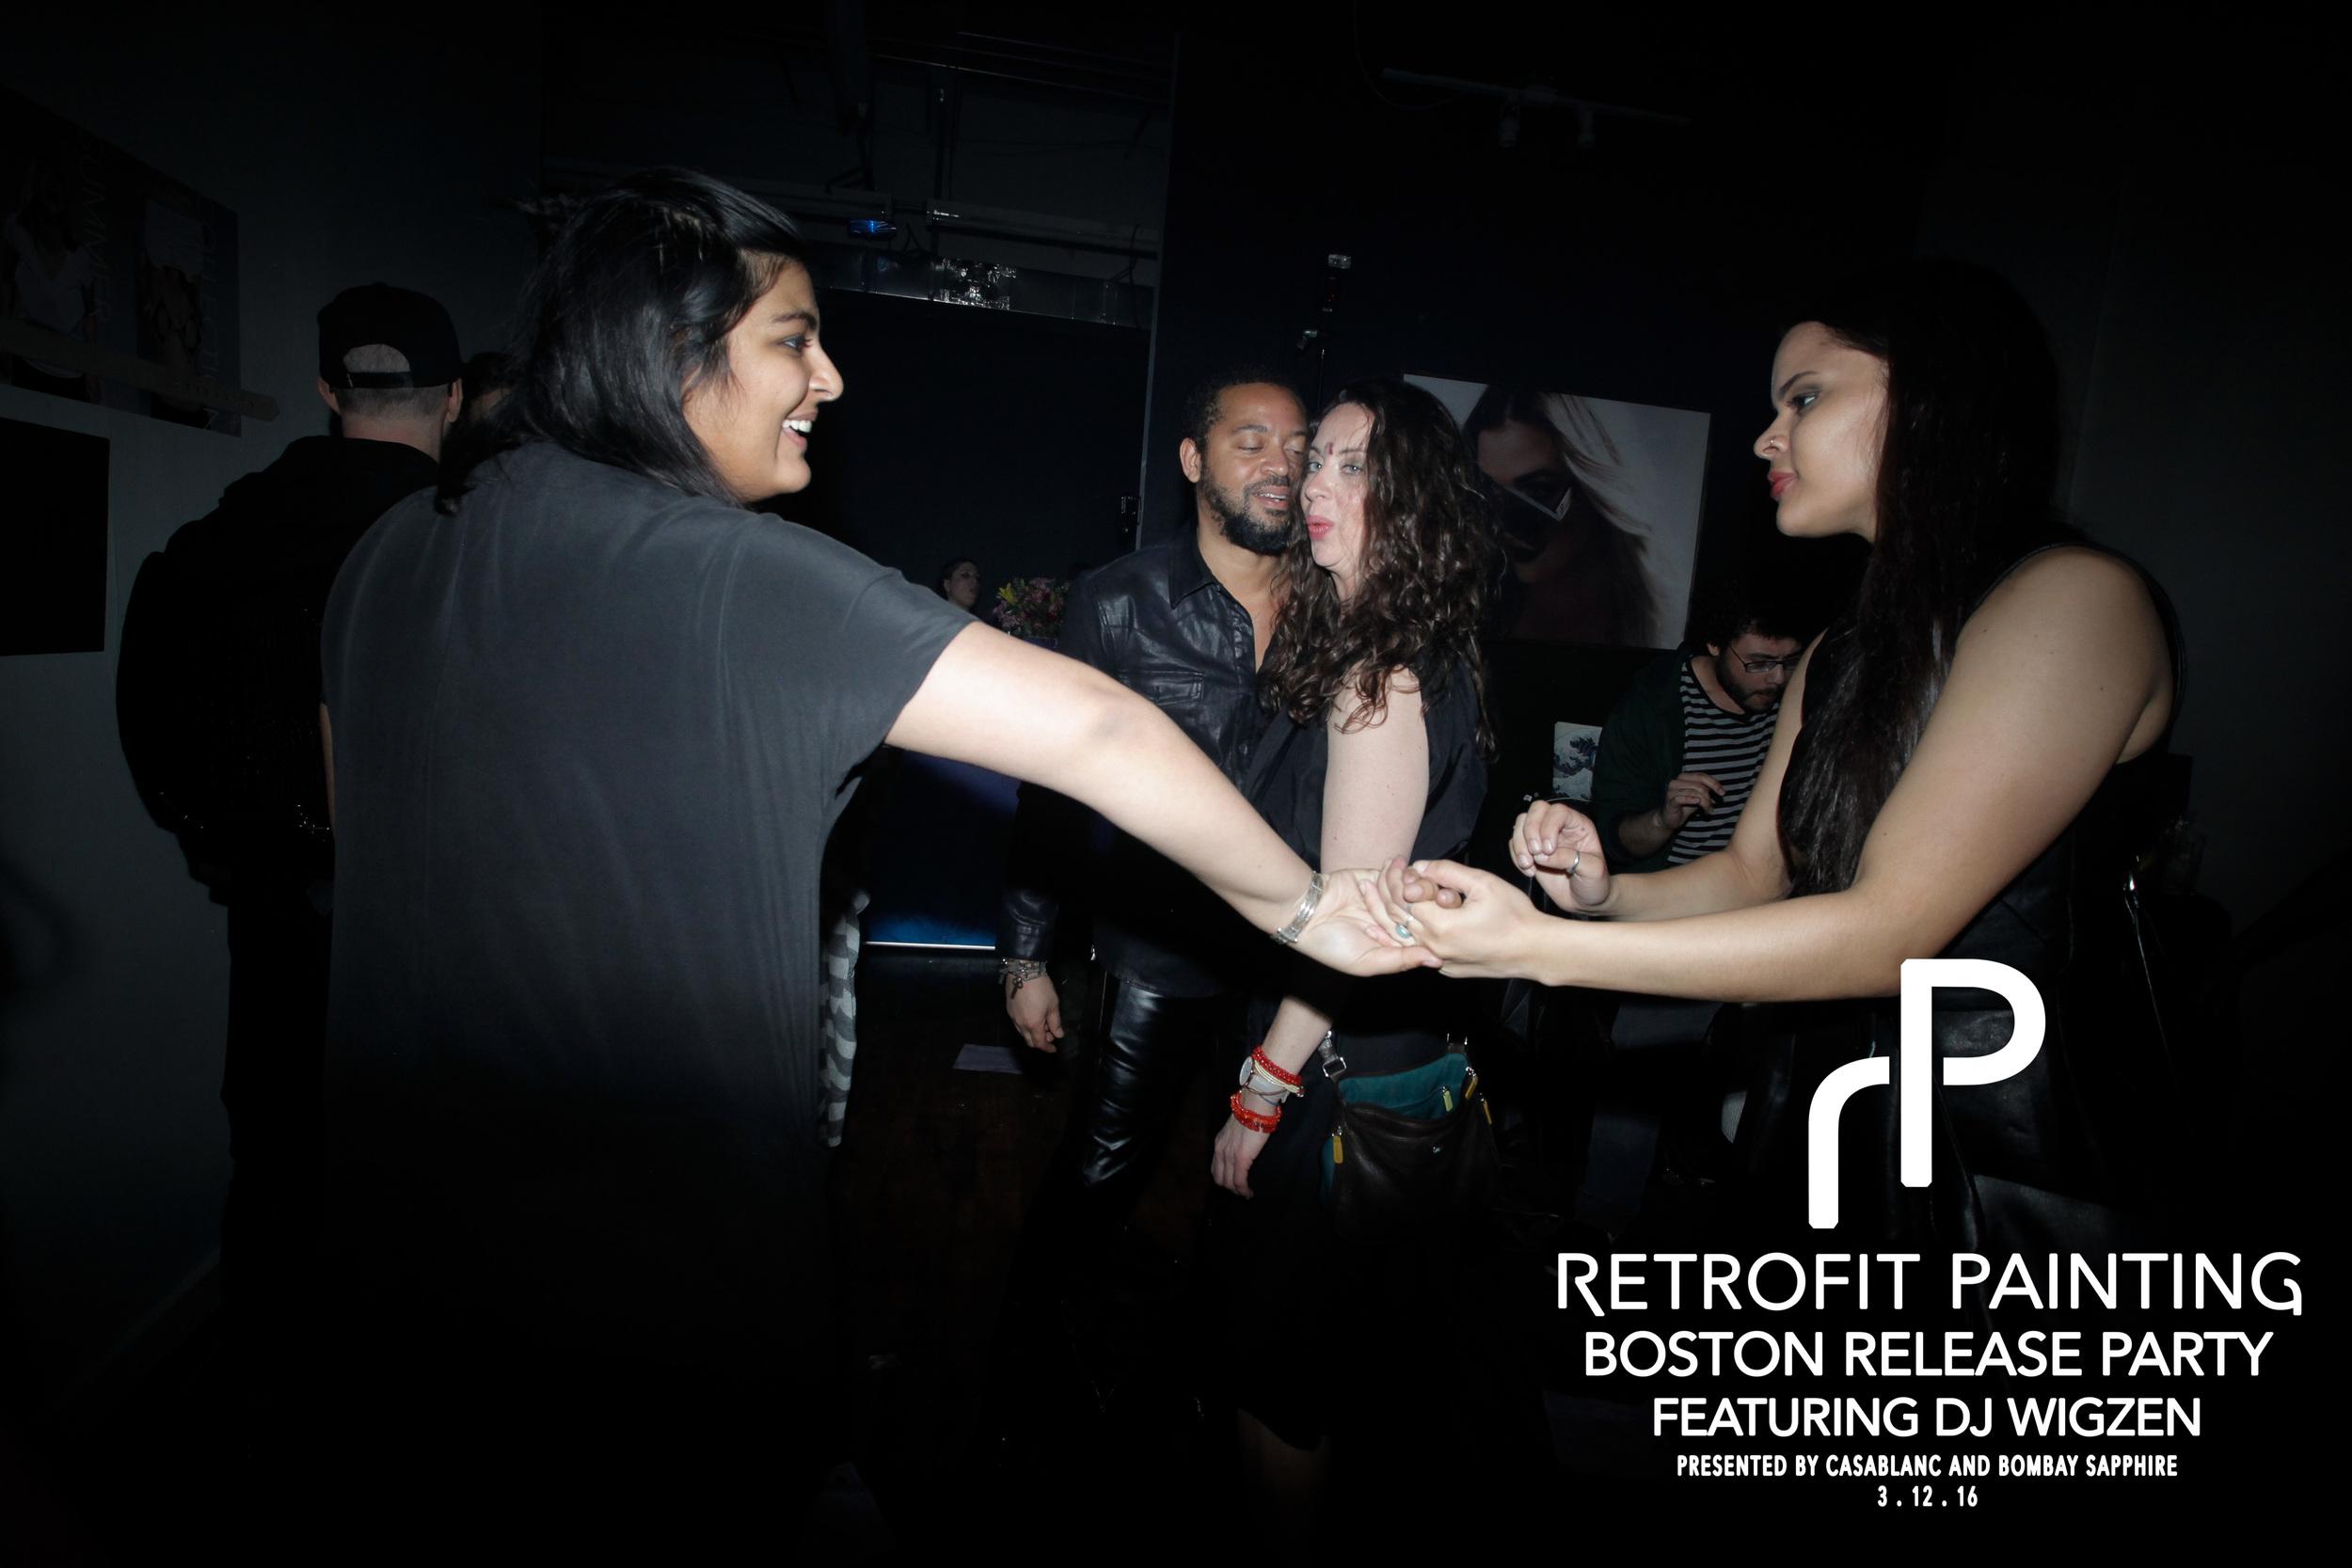 Retrofit Painting Boston Release Party 0158.jpg